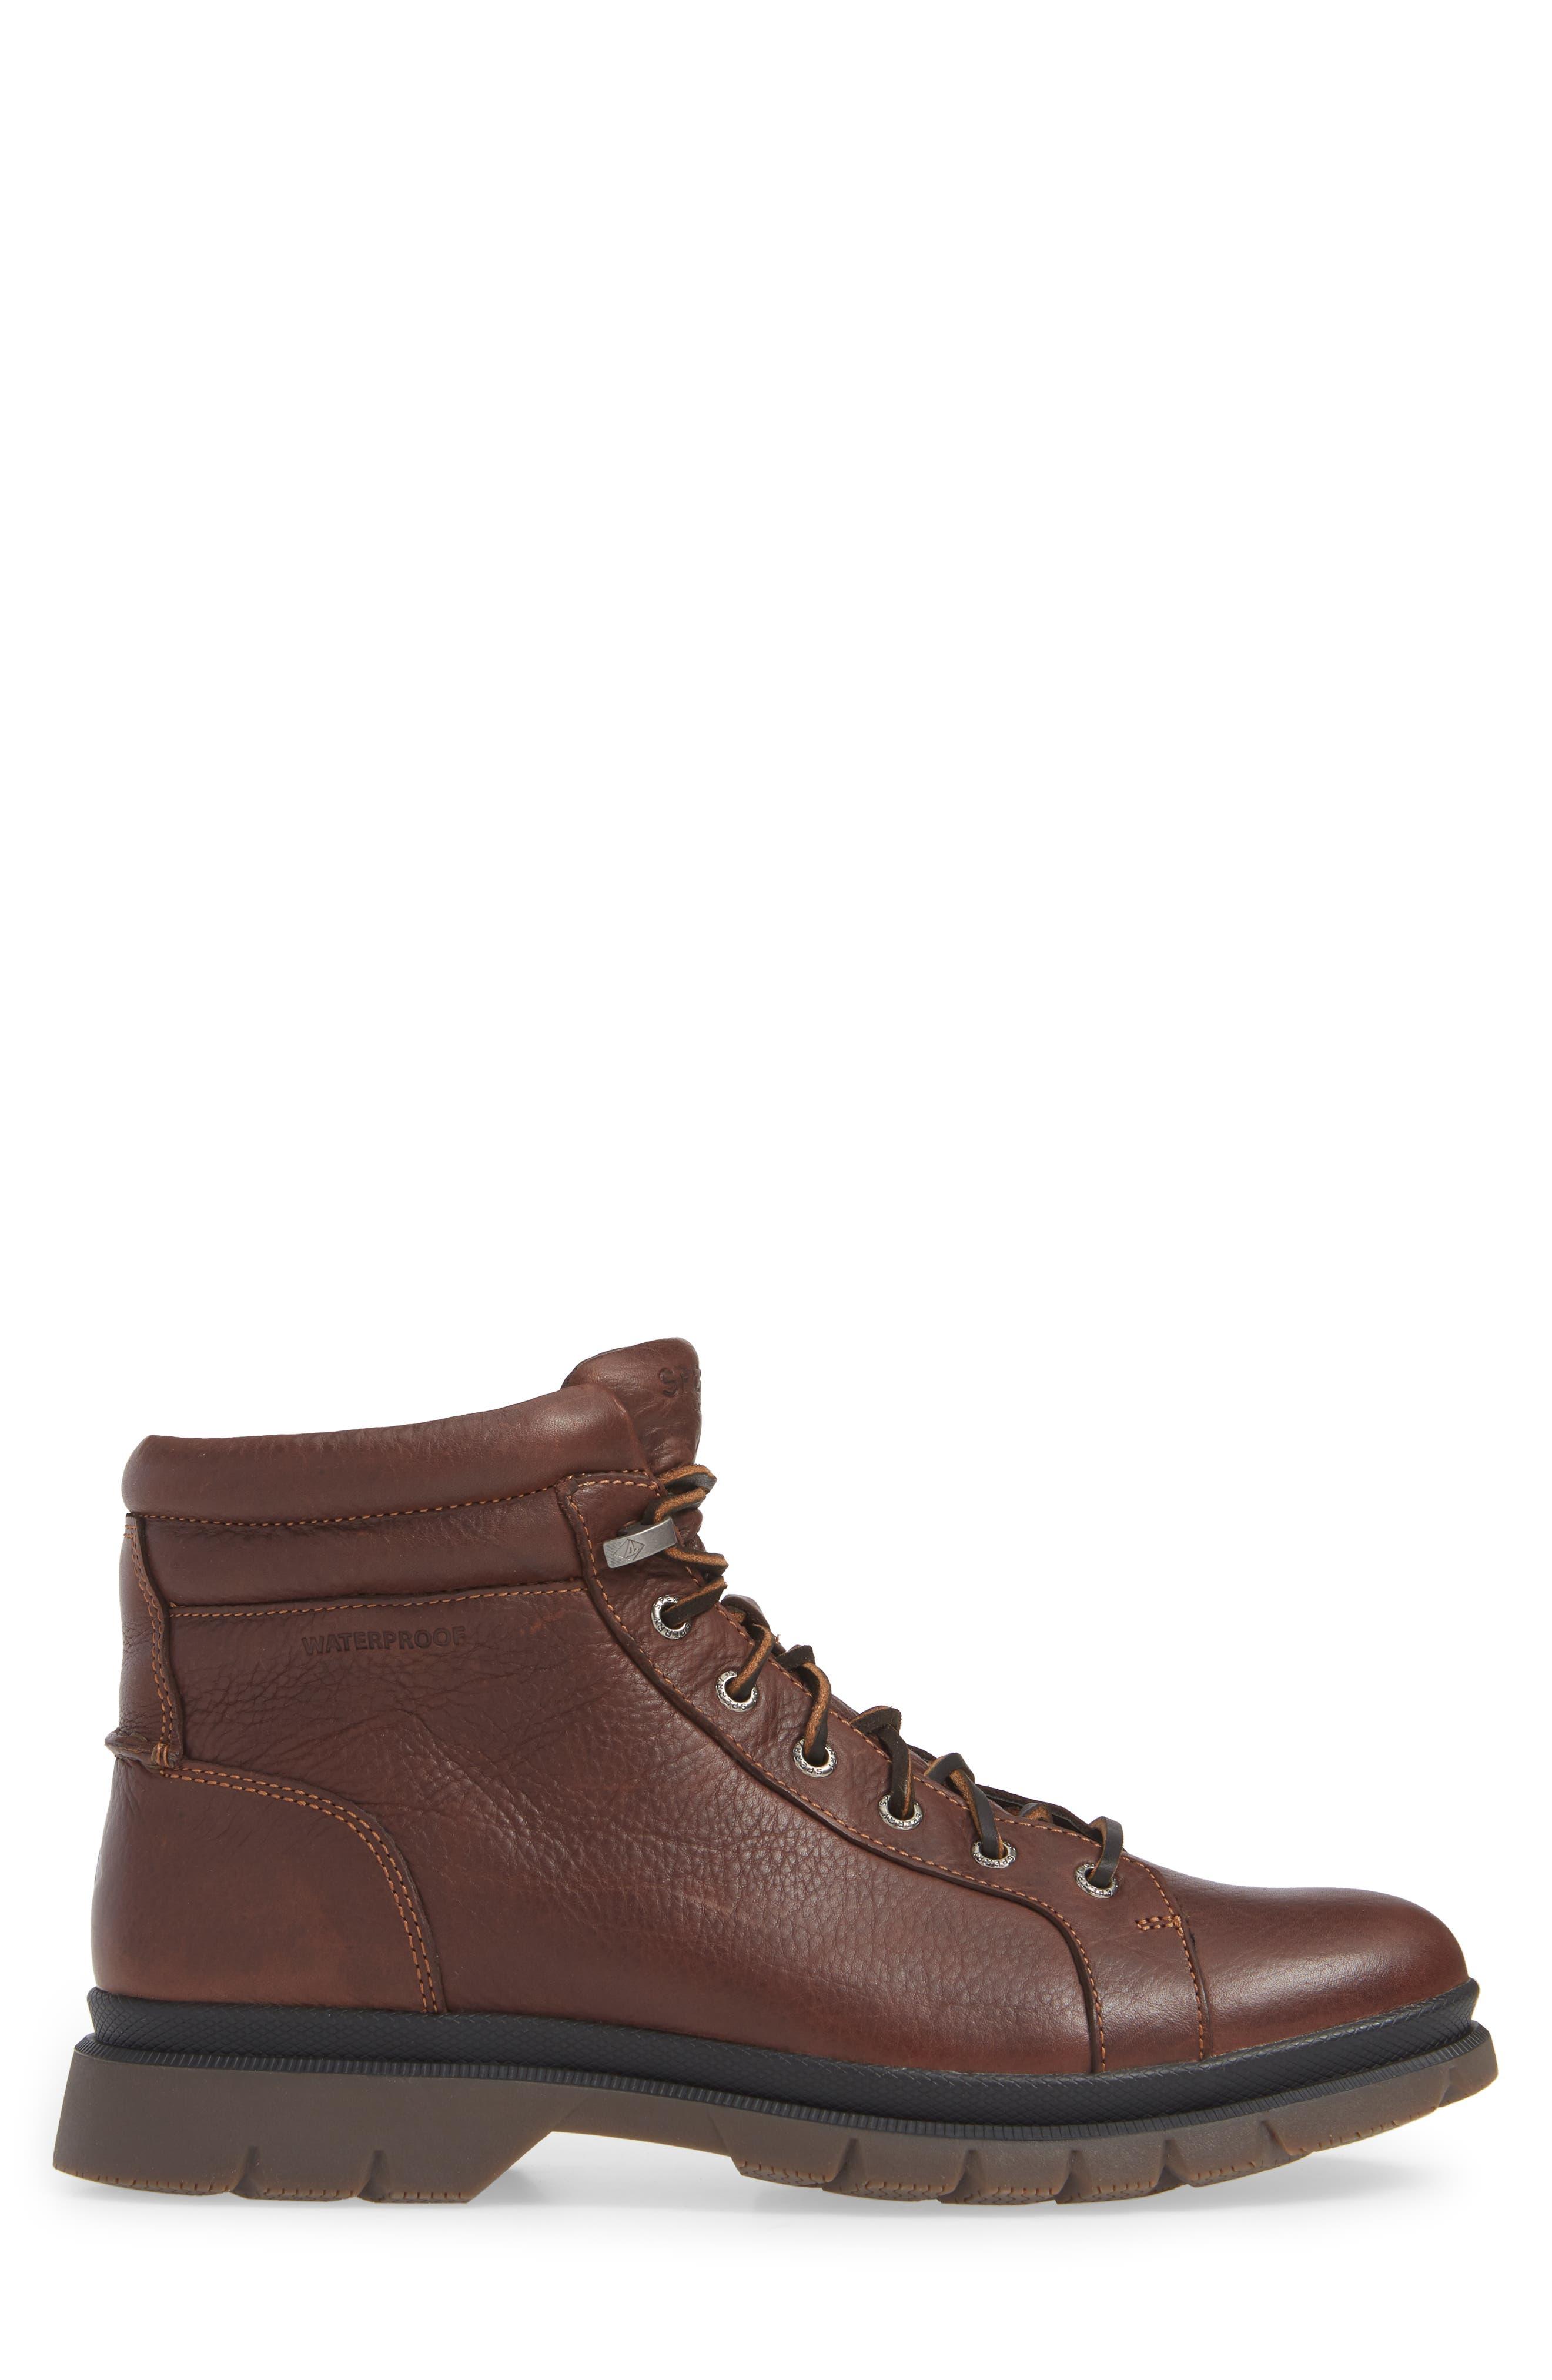 SPERRY, Watertown Waterproof Plain Toe Boot, Alternate thumbnail 3, color, DARK BROWN